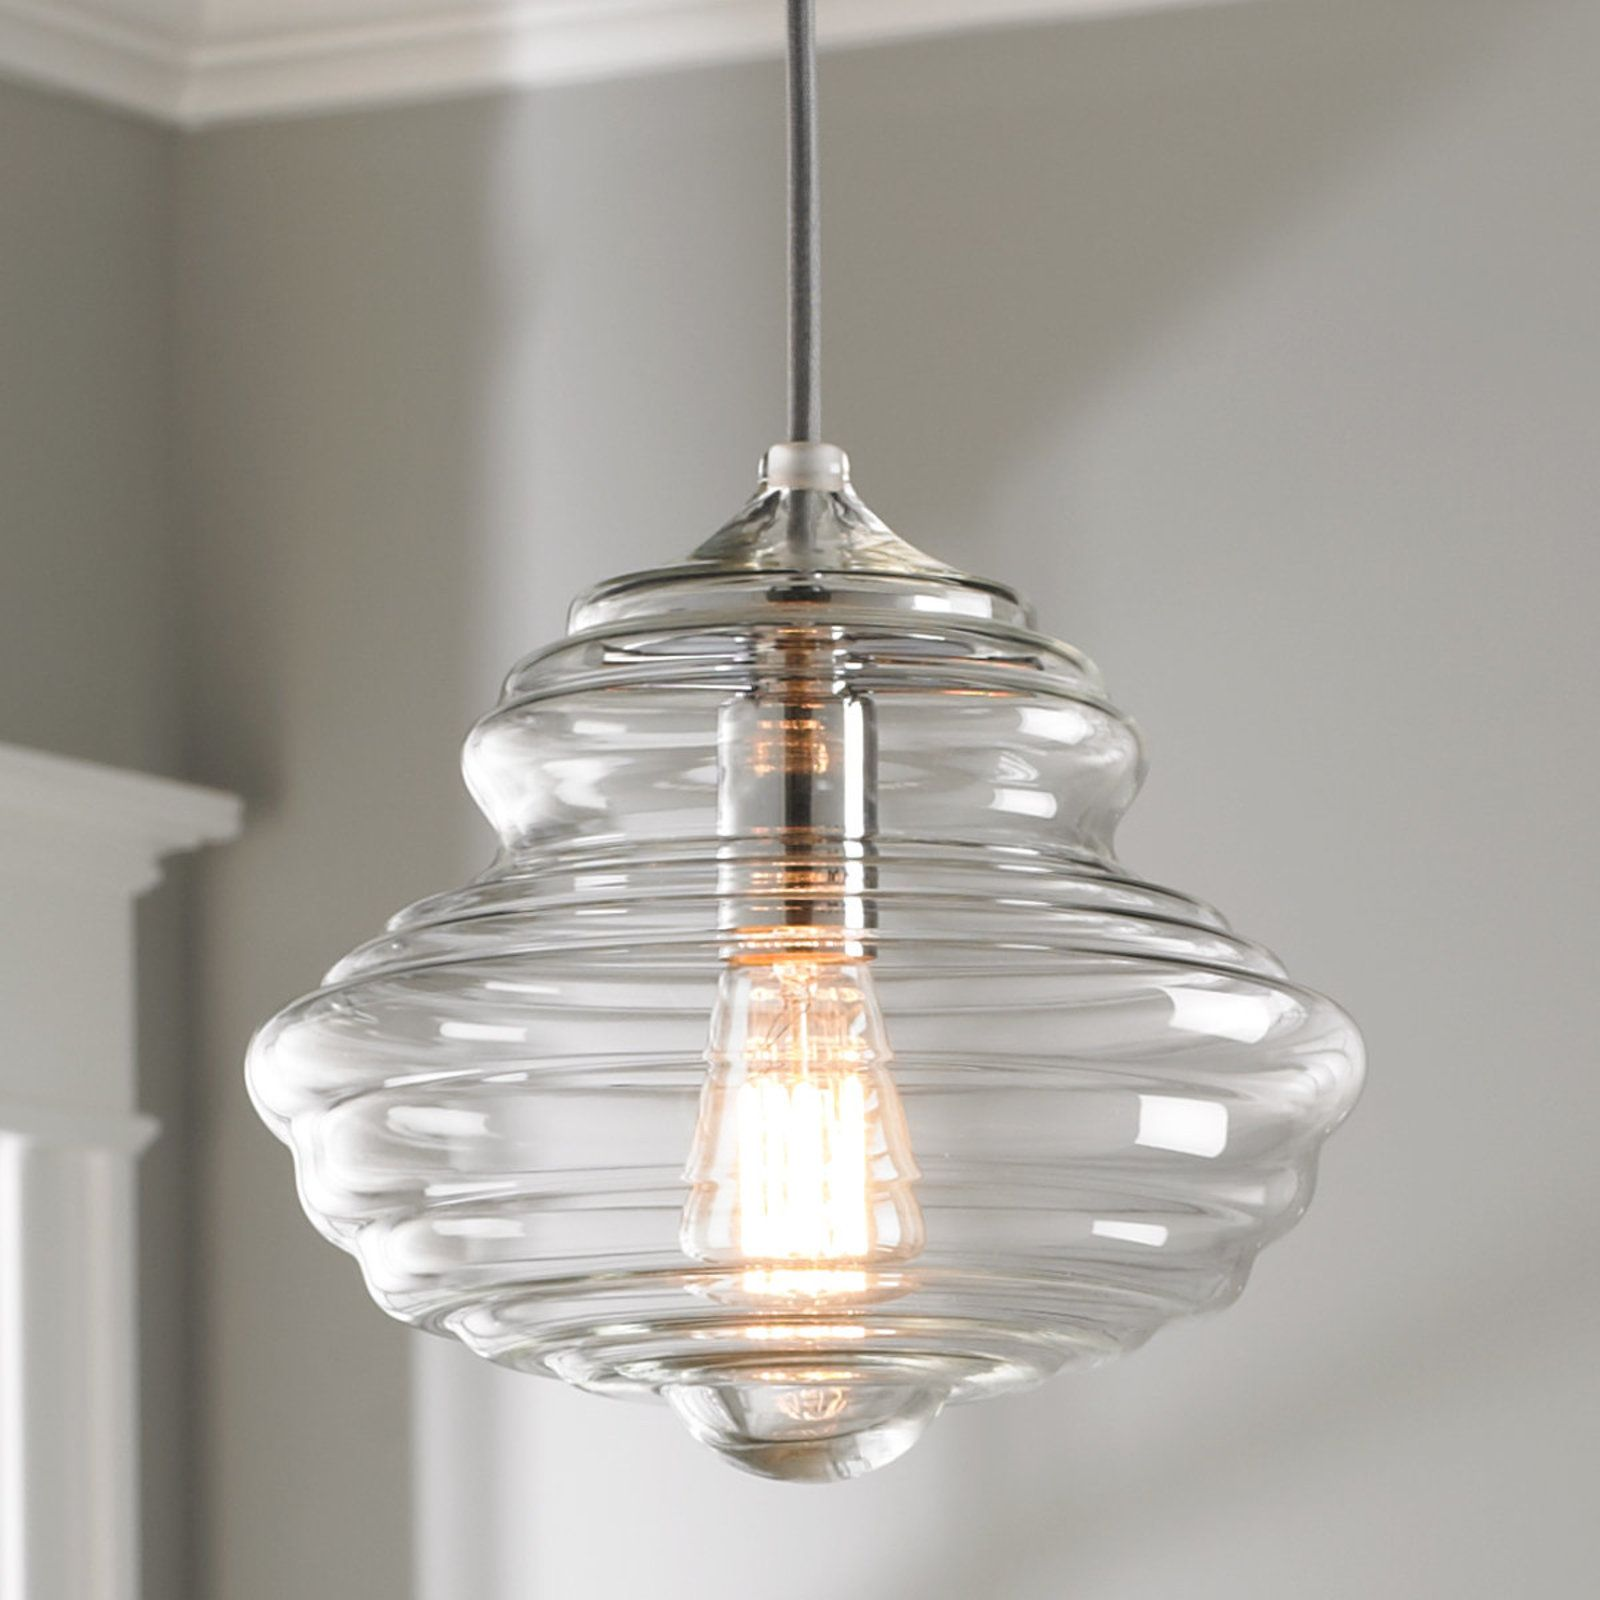 Closed Bell Gl Pendant Chrome Kitchen Light